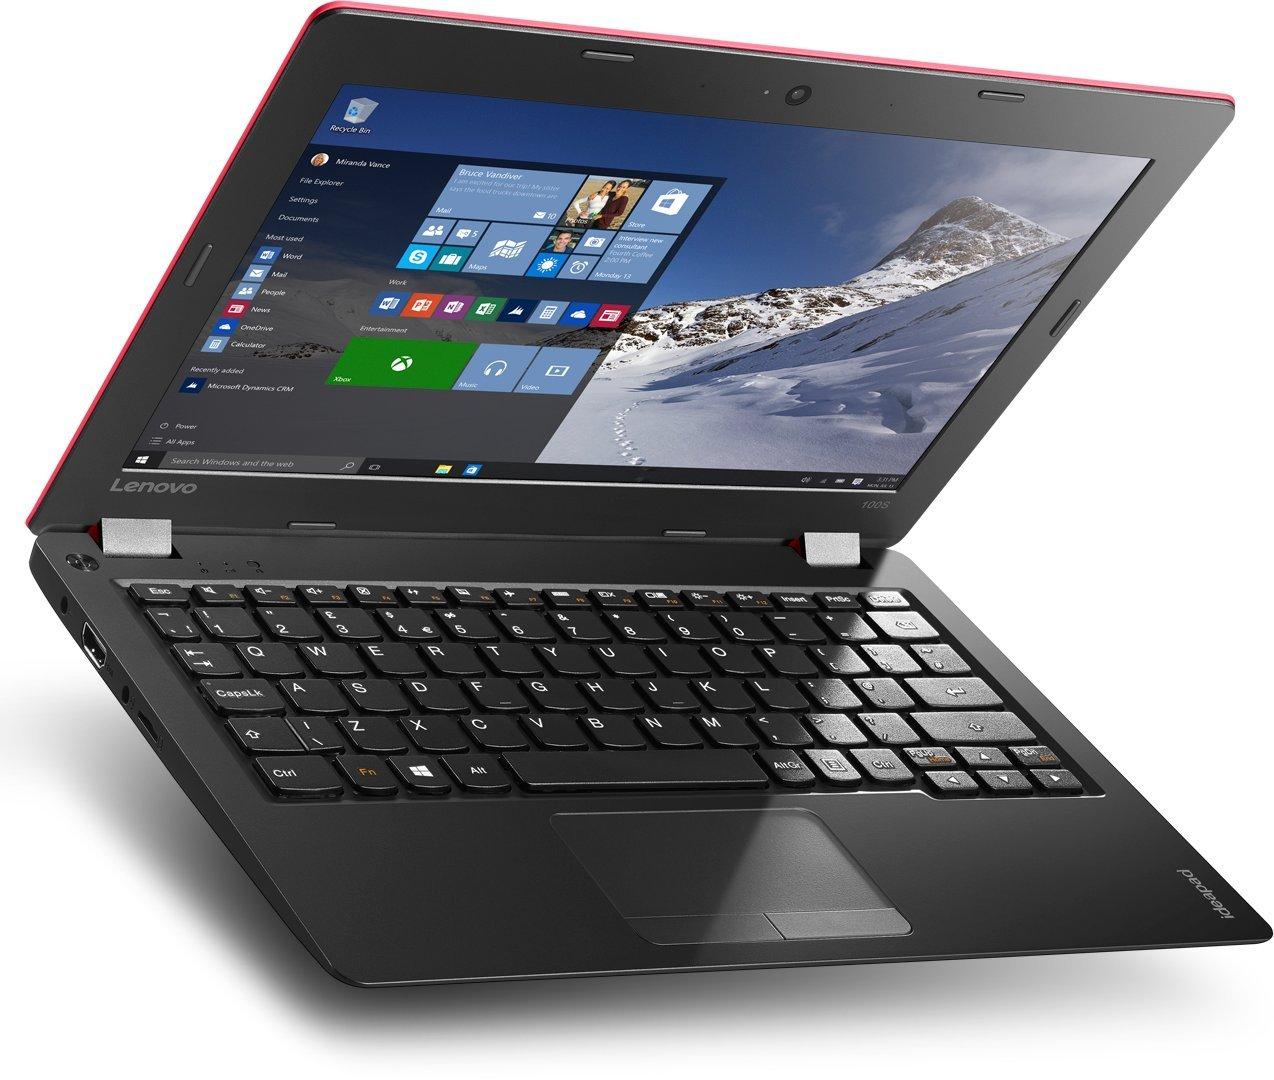 Lenovo 100S-11IBY - Ordenador portátil, Pantalla 11,6 Full HD Matt, Intel Atom Z3735F, 2 GB RAM, Disco Duro 32 GB SSD, HD TN GL Slim, Windows 10 Home ...